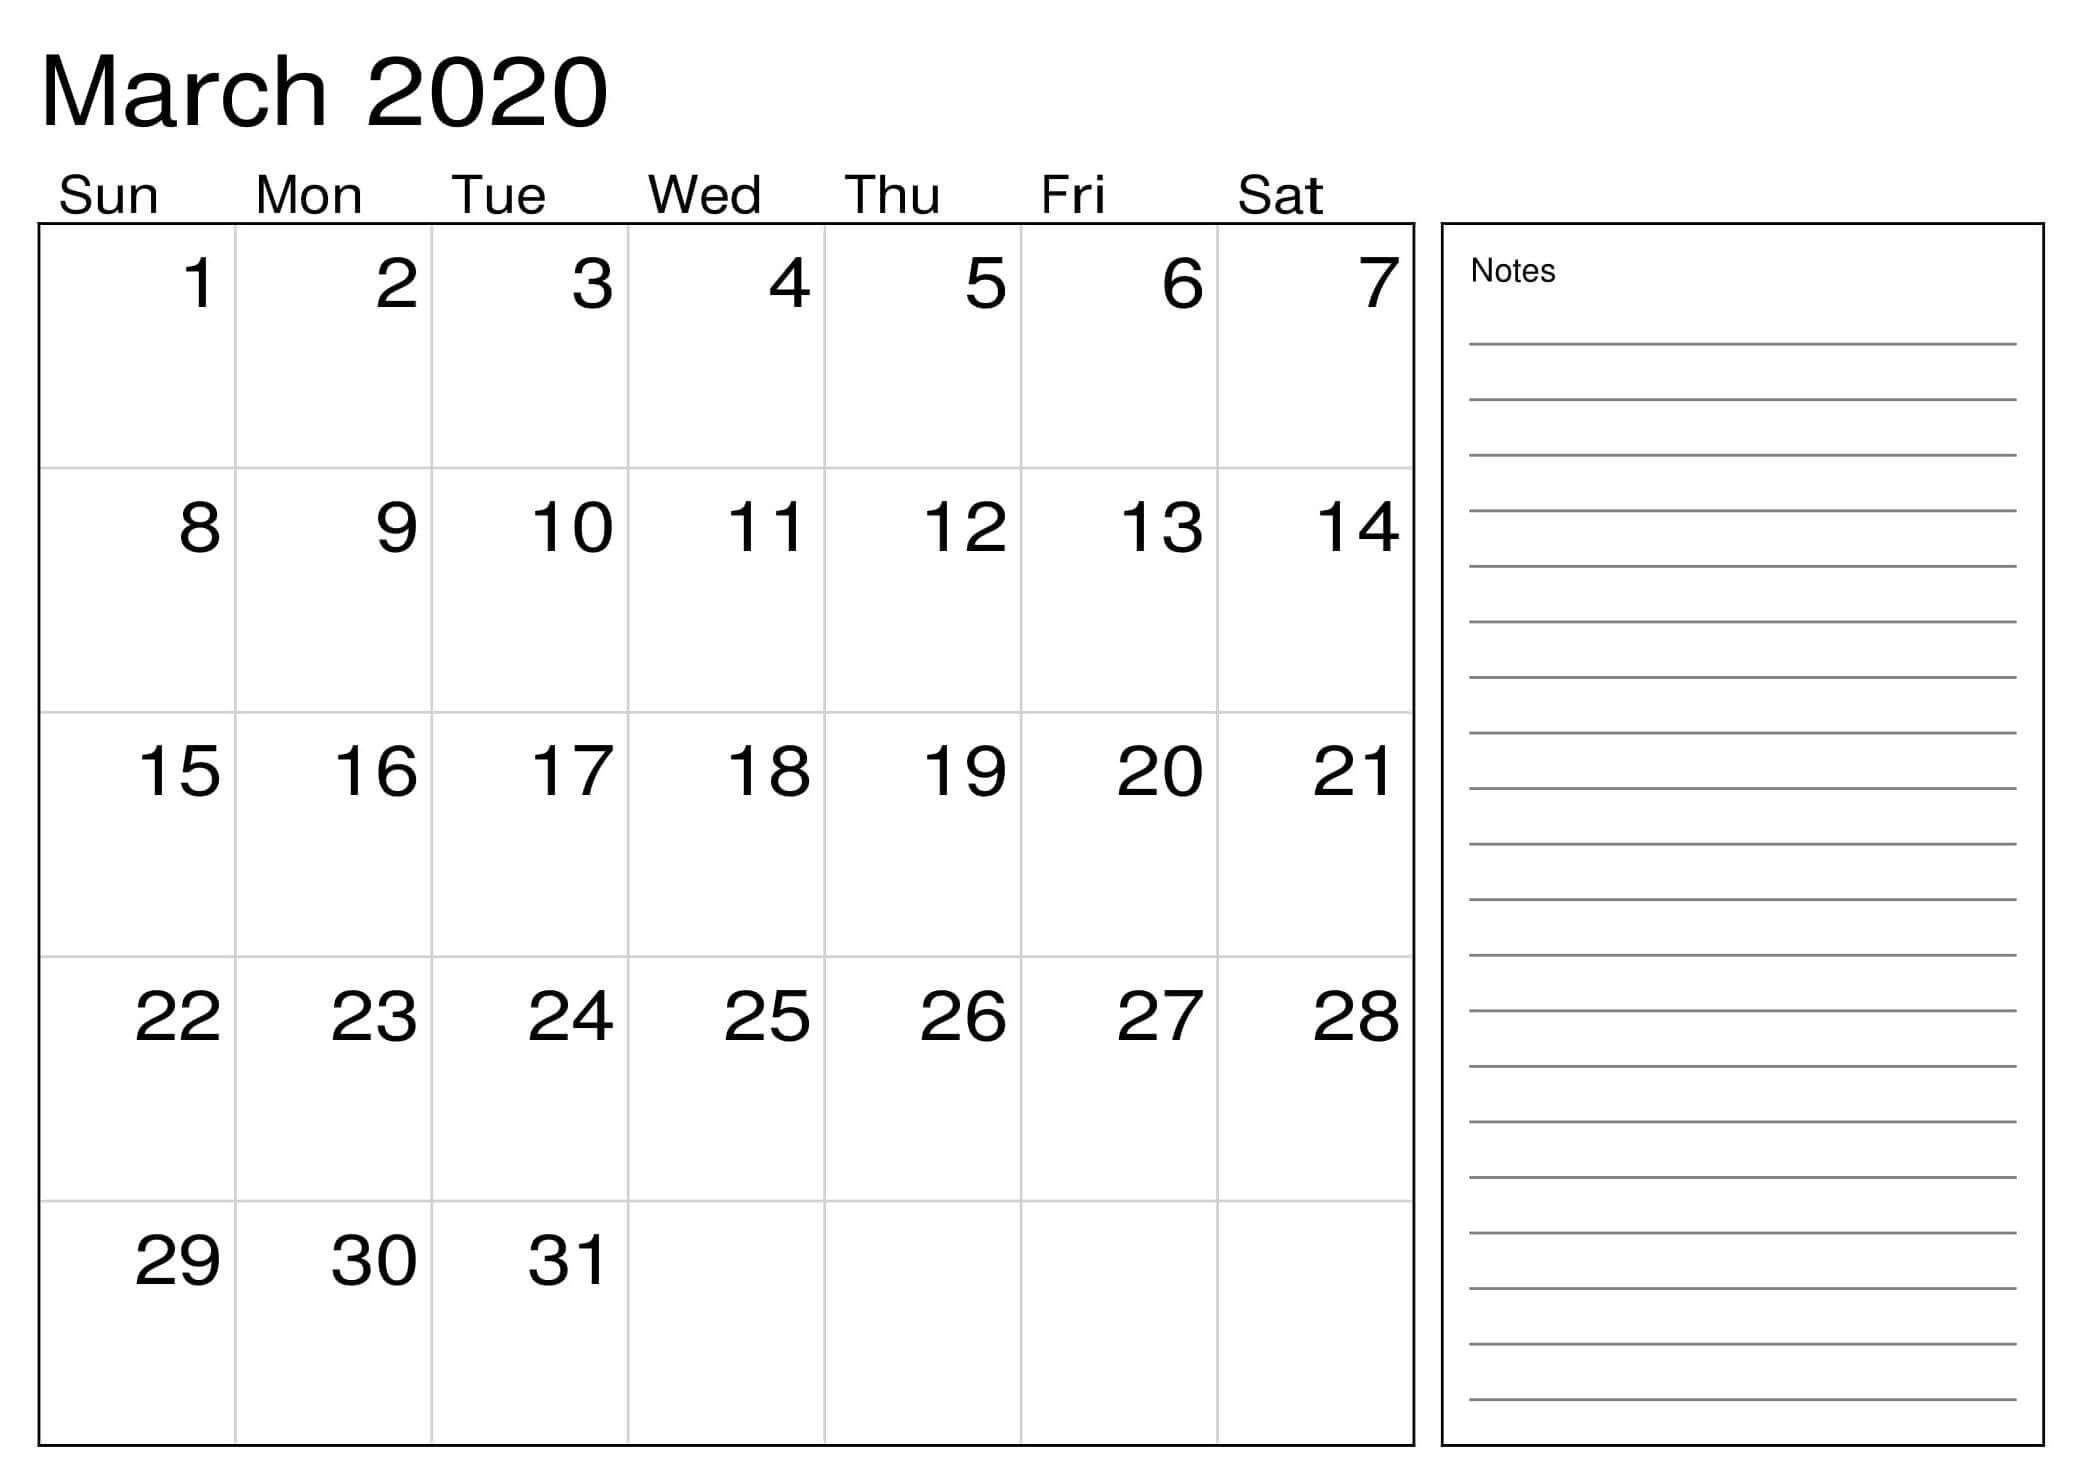 March 2020 Calendar Excel Sheet | Free Printable Calendar 2 Week Activity Calendar Editable